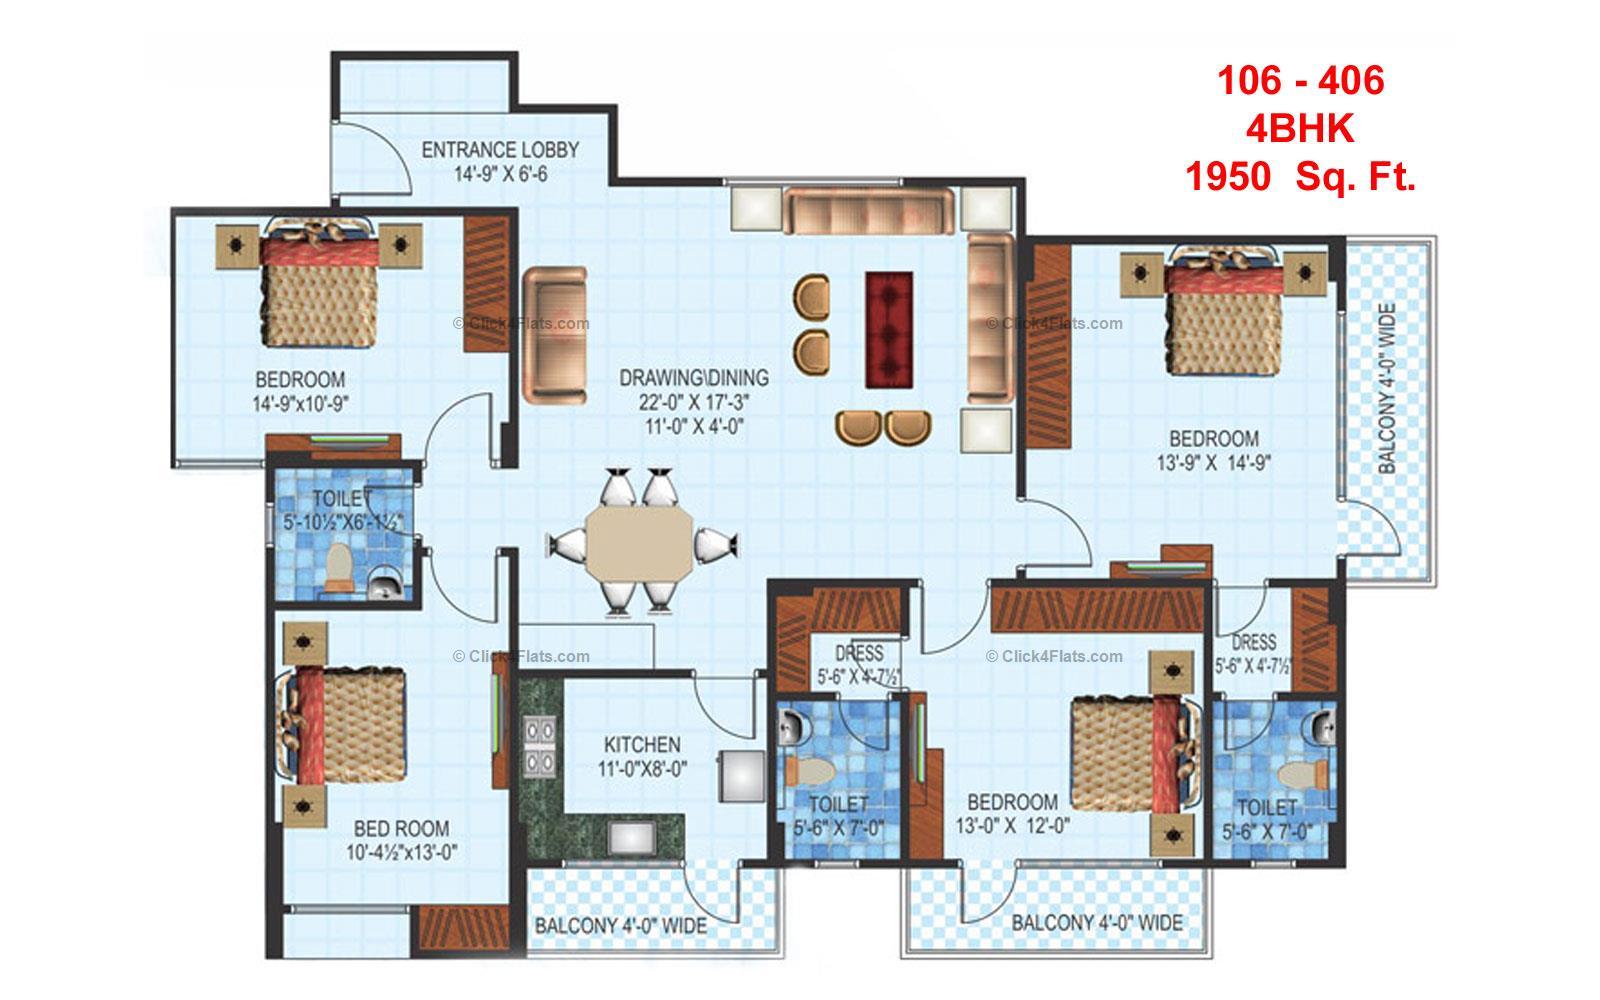 Anukampa Residency 4 BHK 1950 square feet